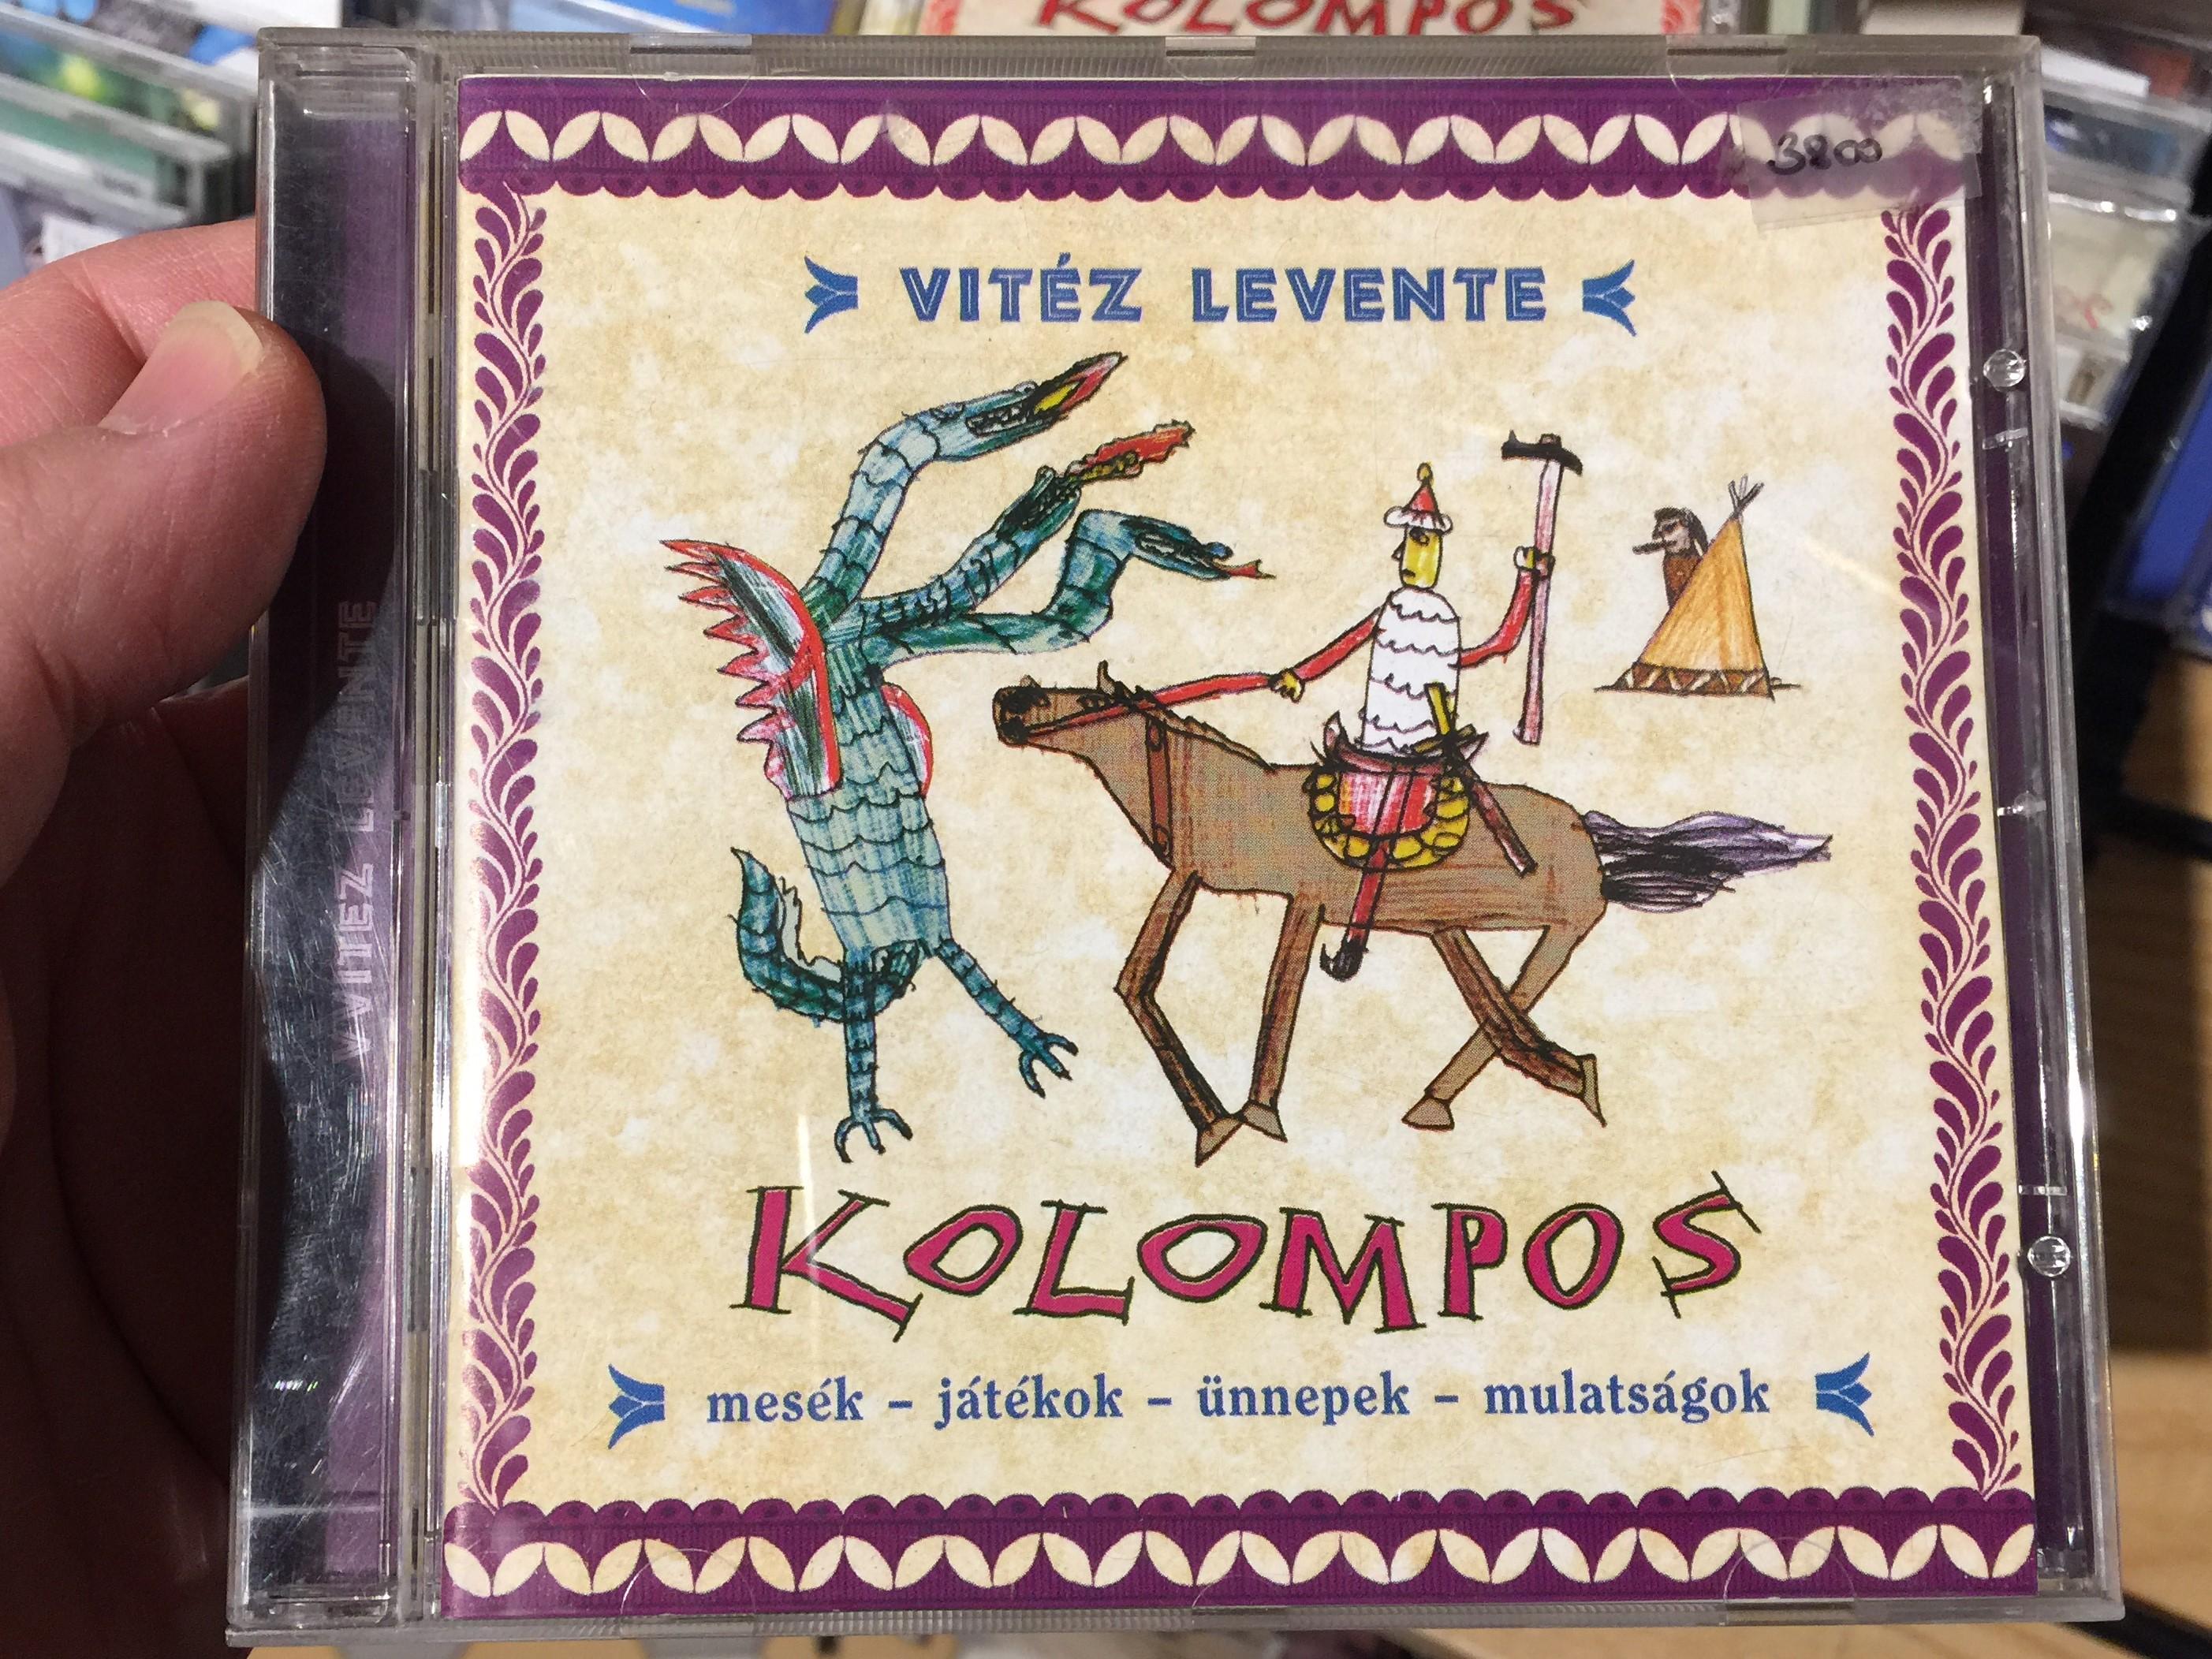 vit-z-levente-kolompos-mes-k-j-t-kok-nnepek-mulats-gok-kolompos-kkt.-audio-cd-2006-k-06-1-.jpg